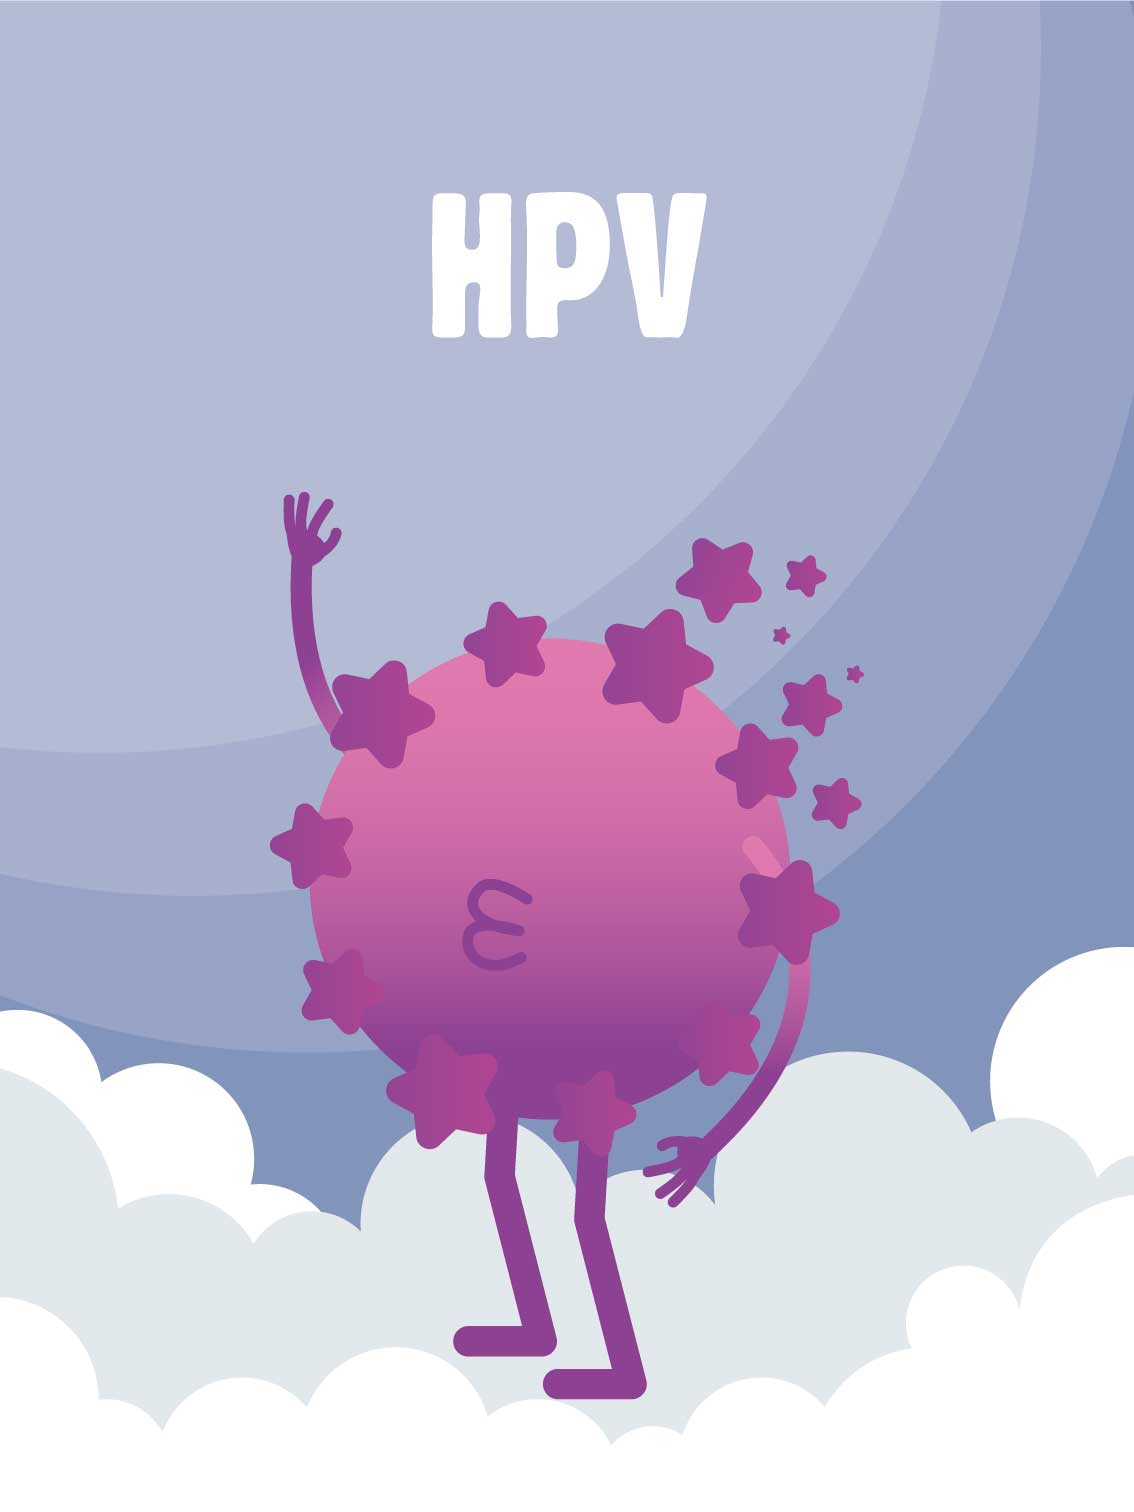 Soigner le papillomavirus chez lhomme - triplus.ro